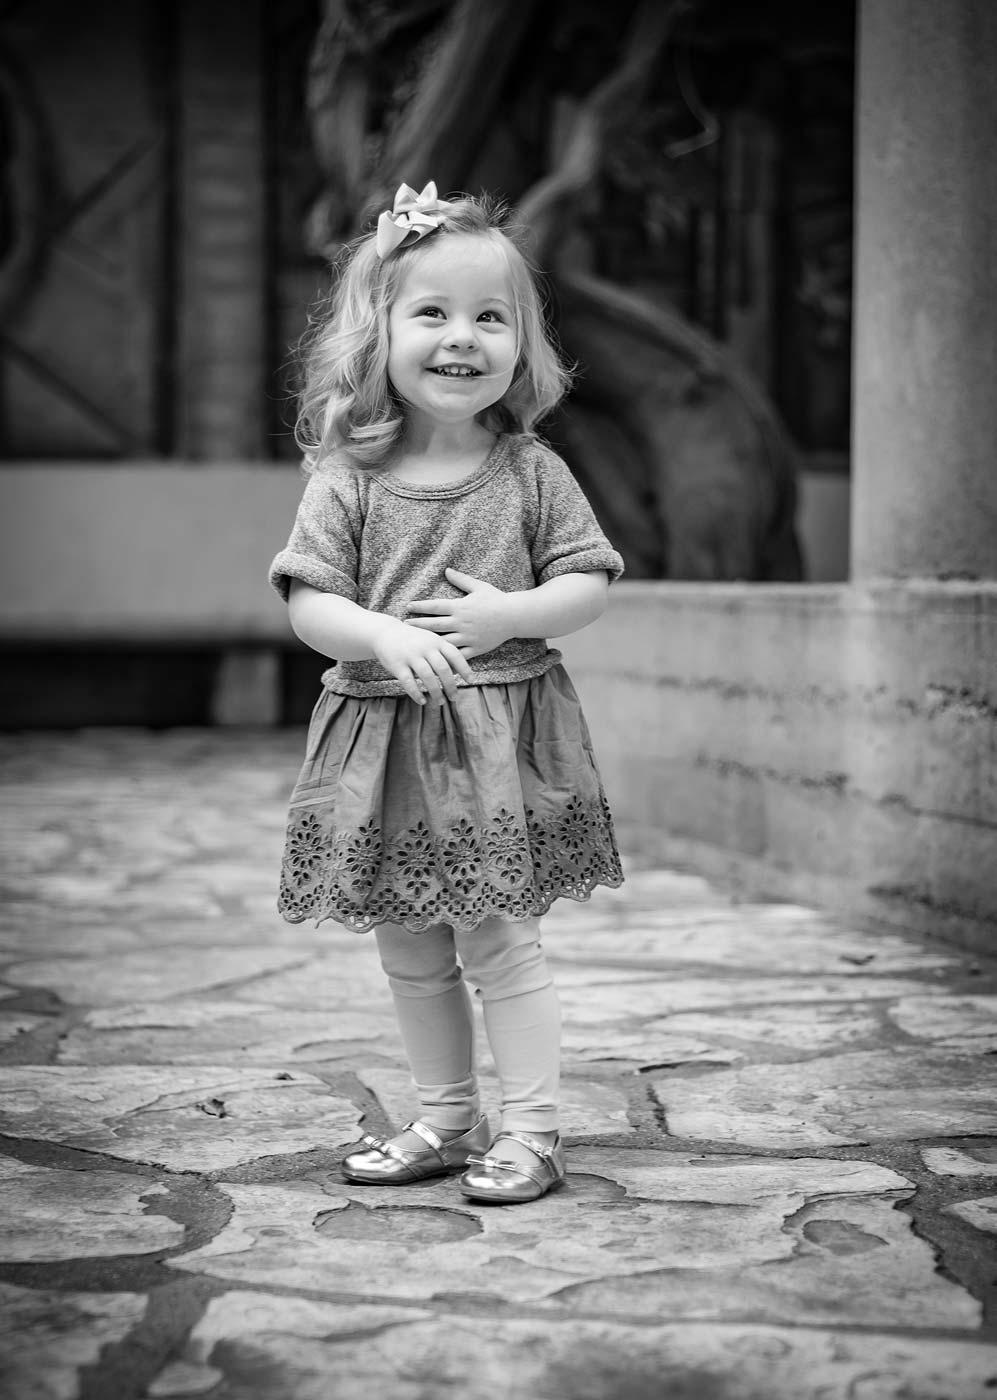 sMiss-Emma-and-Family---2-Years---Jan-2016-66.jpg